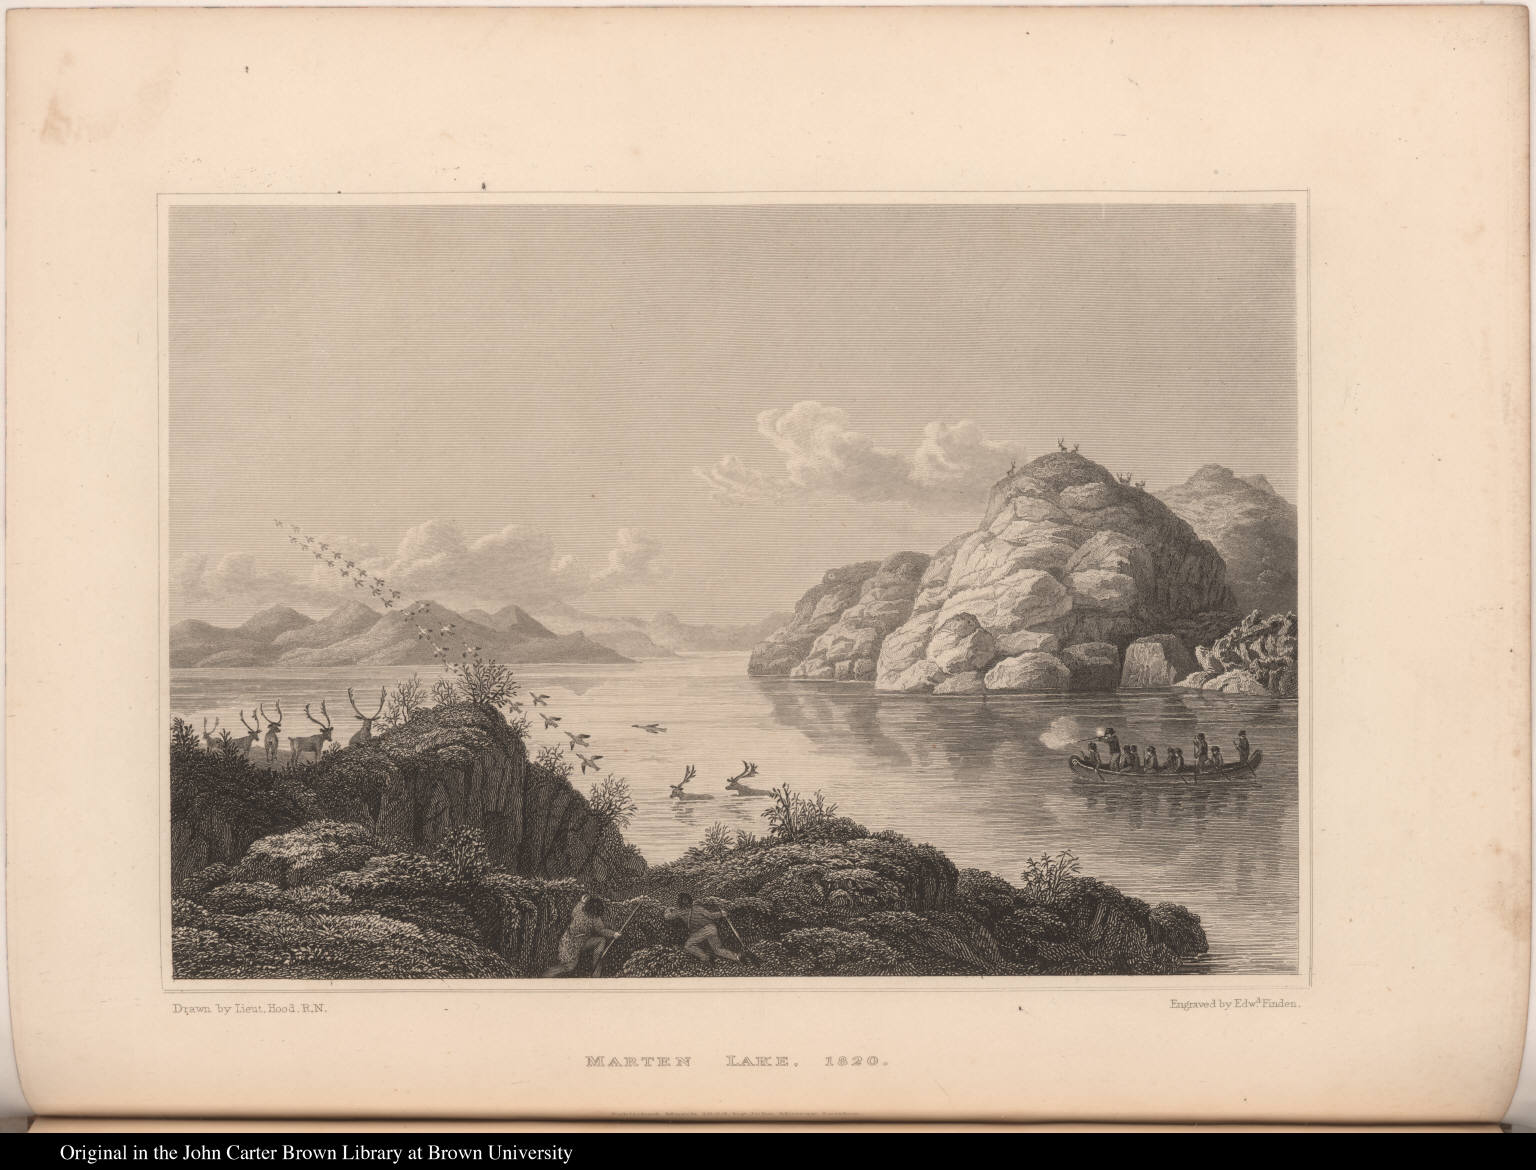 Marten Lake. 1820.